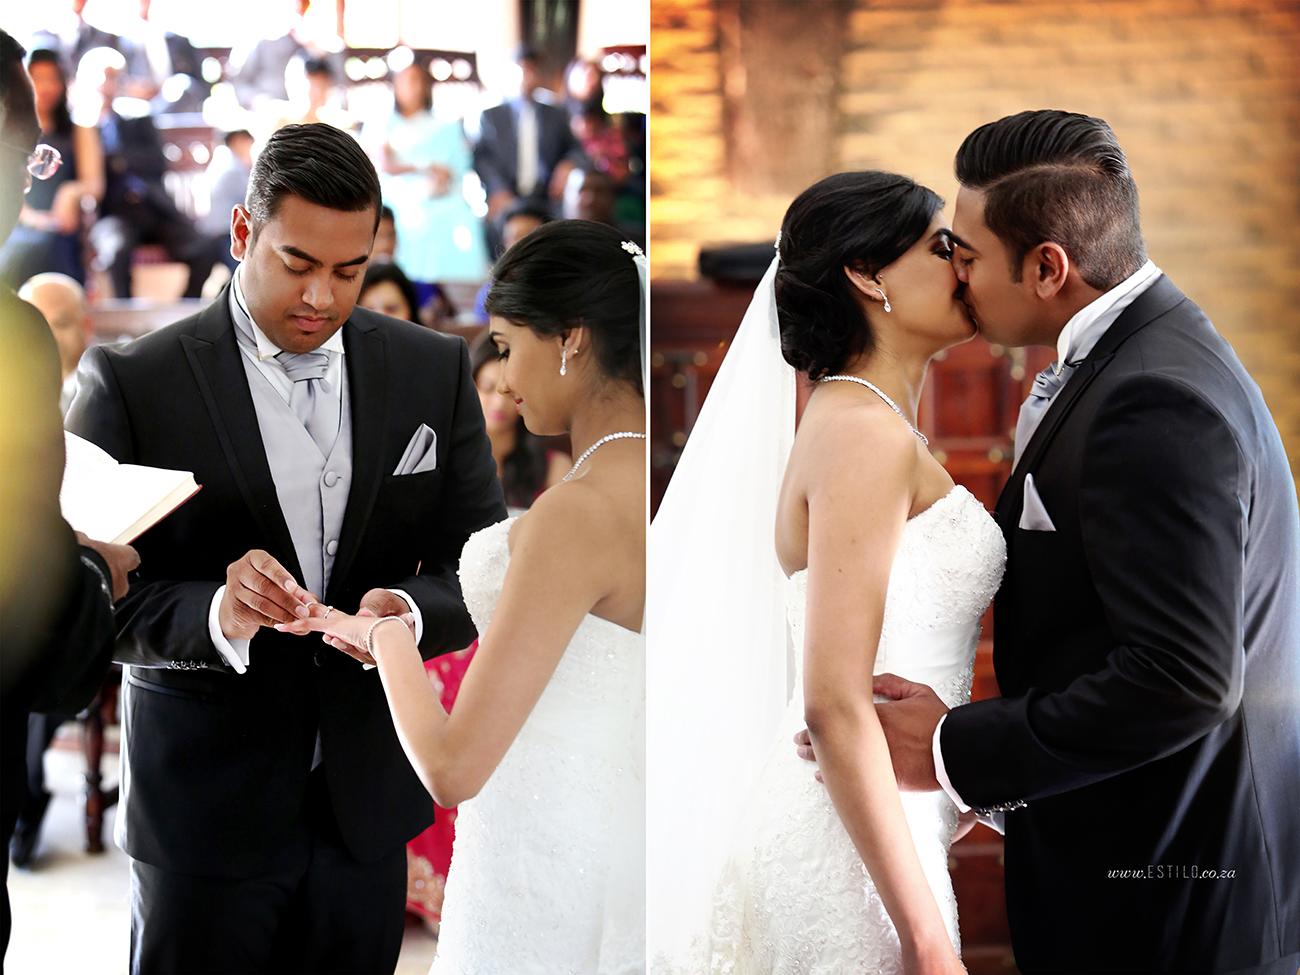 memoire-wedding-photograpgers-weddings-at-memoire-muldersdrift-best-wedding-photographers-gauteng-best-wedding-photographers-south-africa_0024.jpg